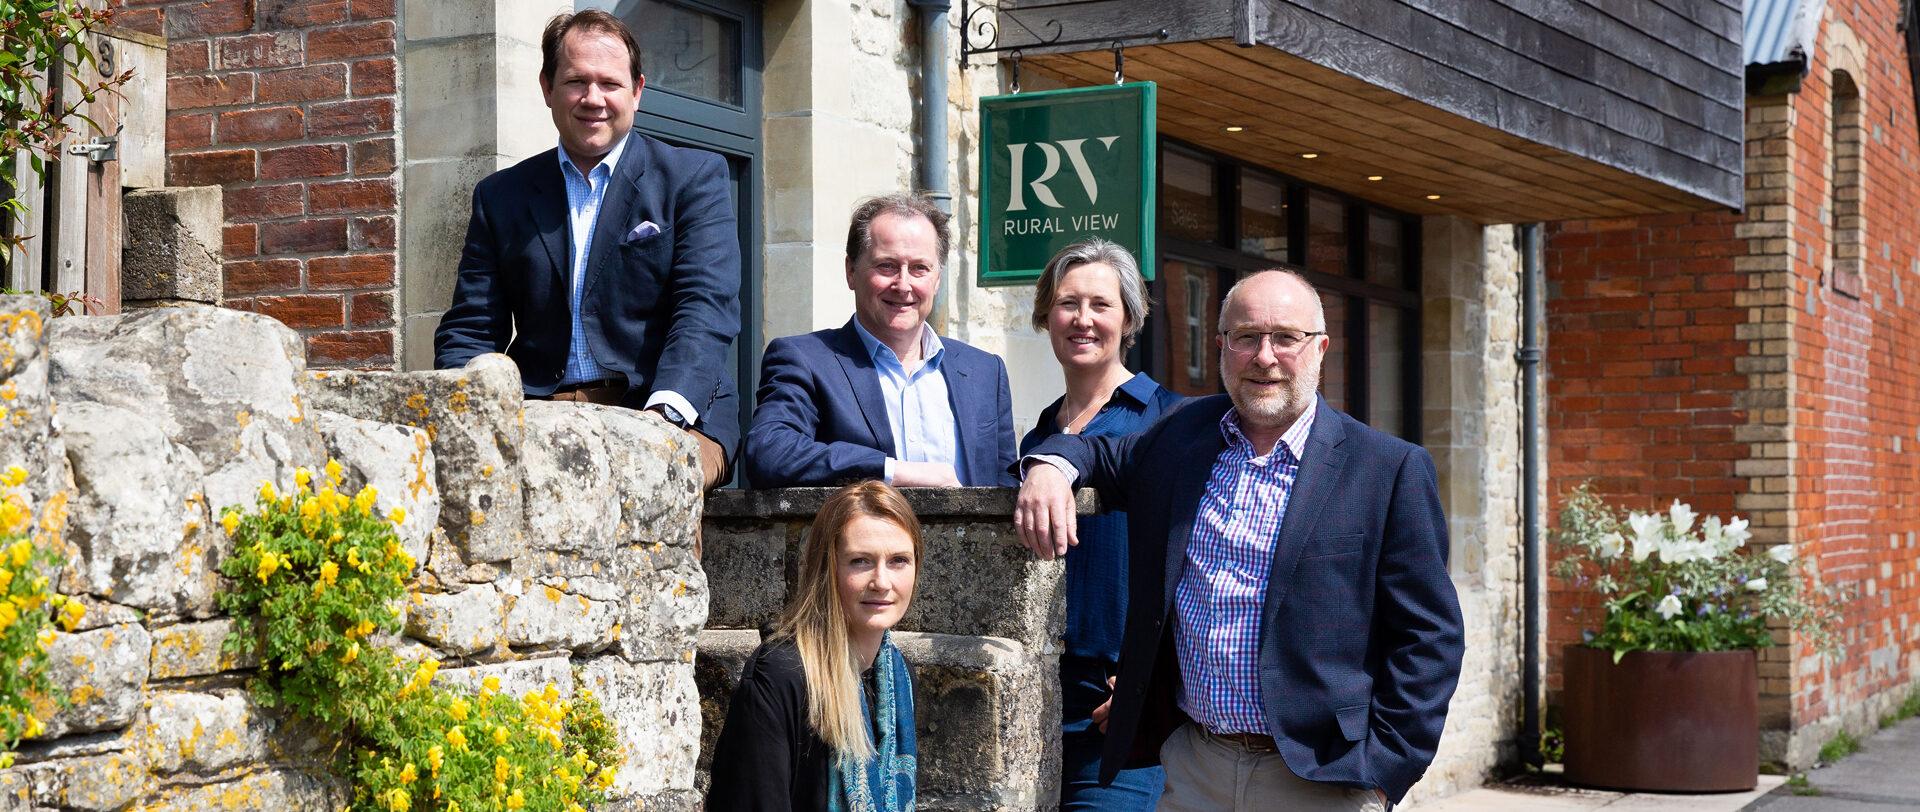 The Rural View team